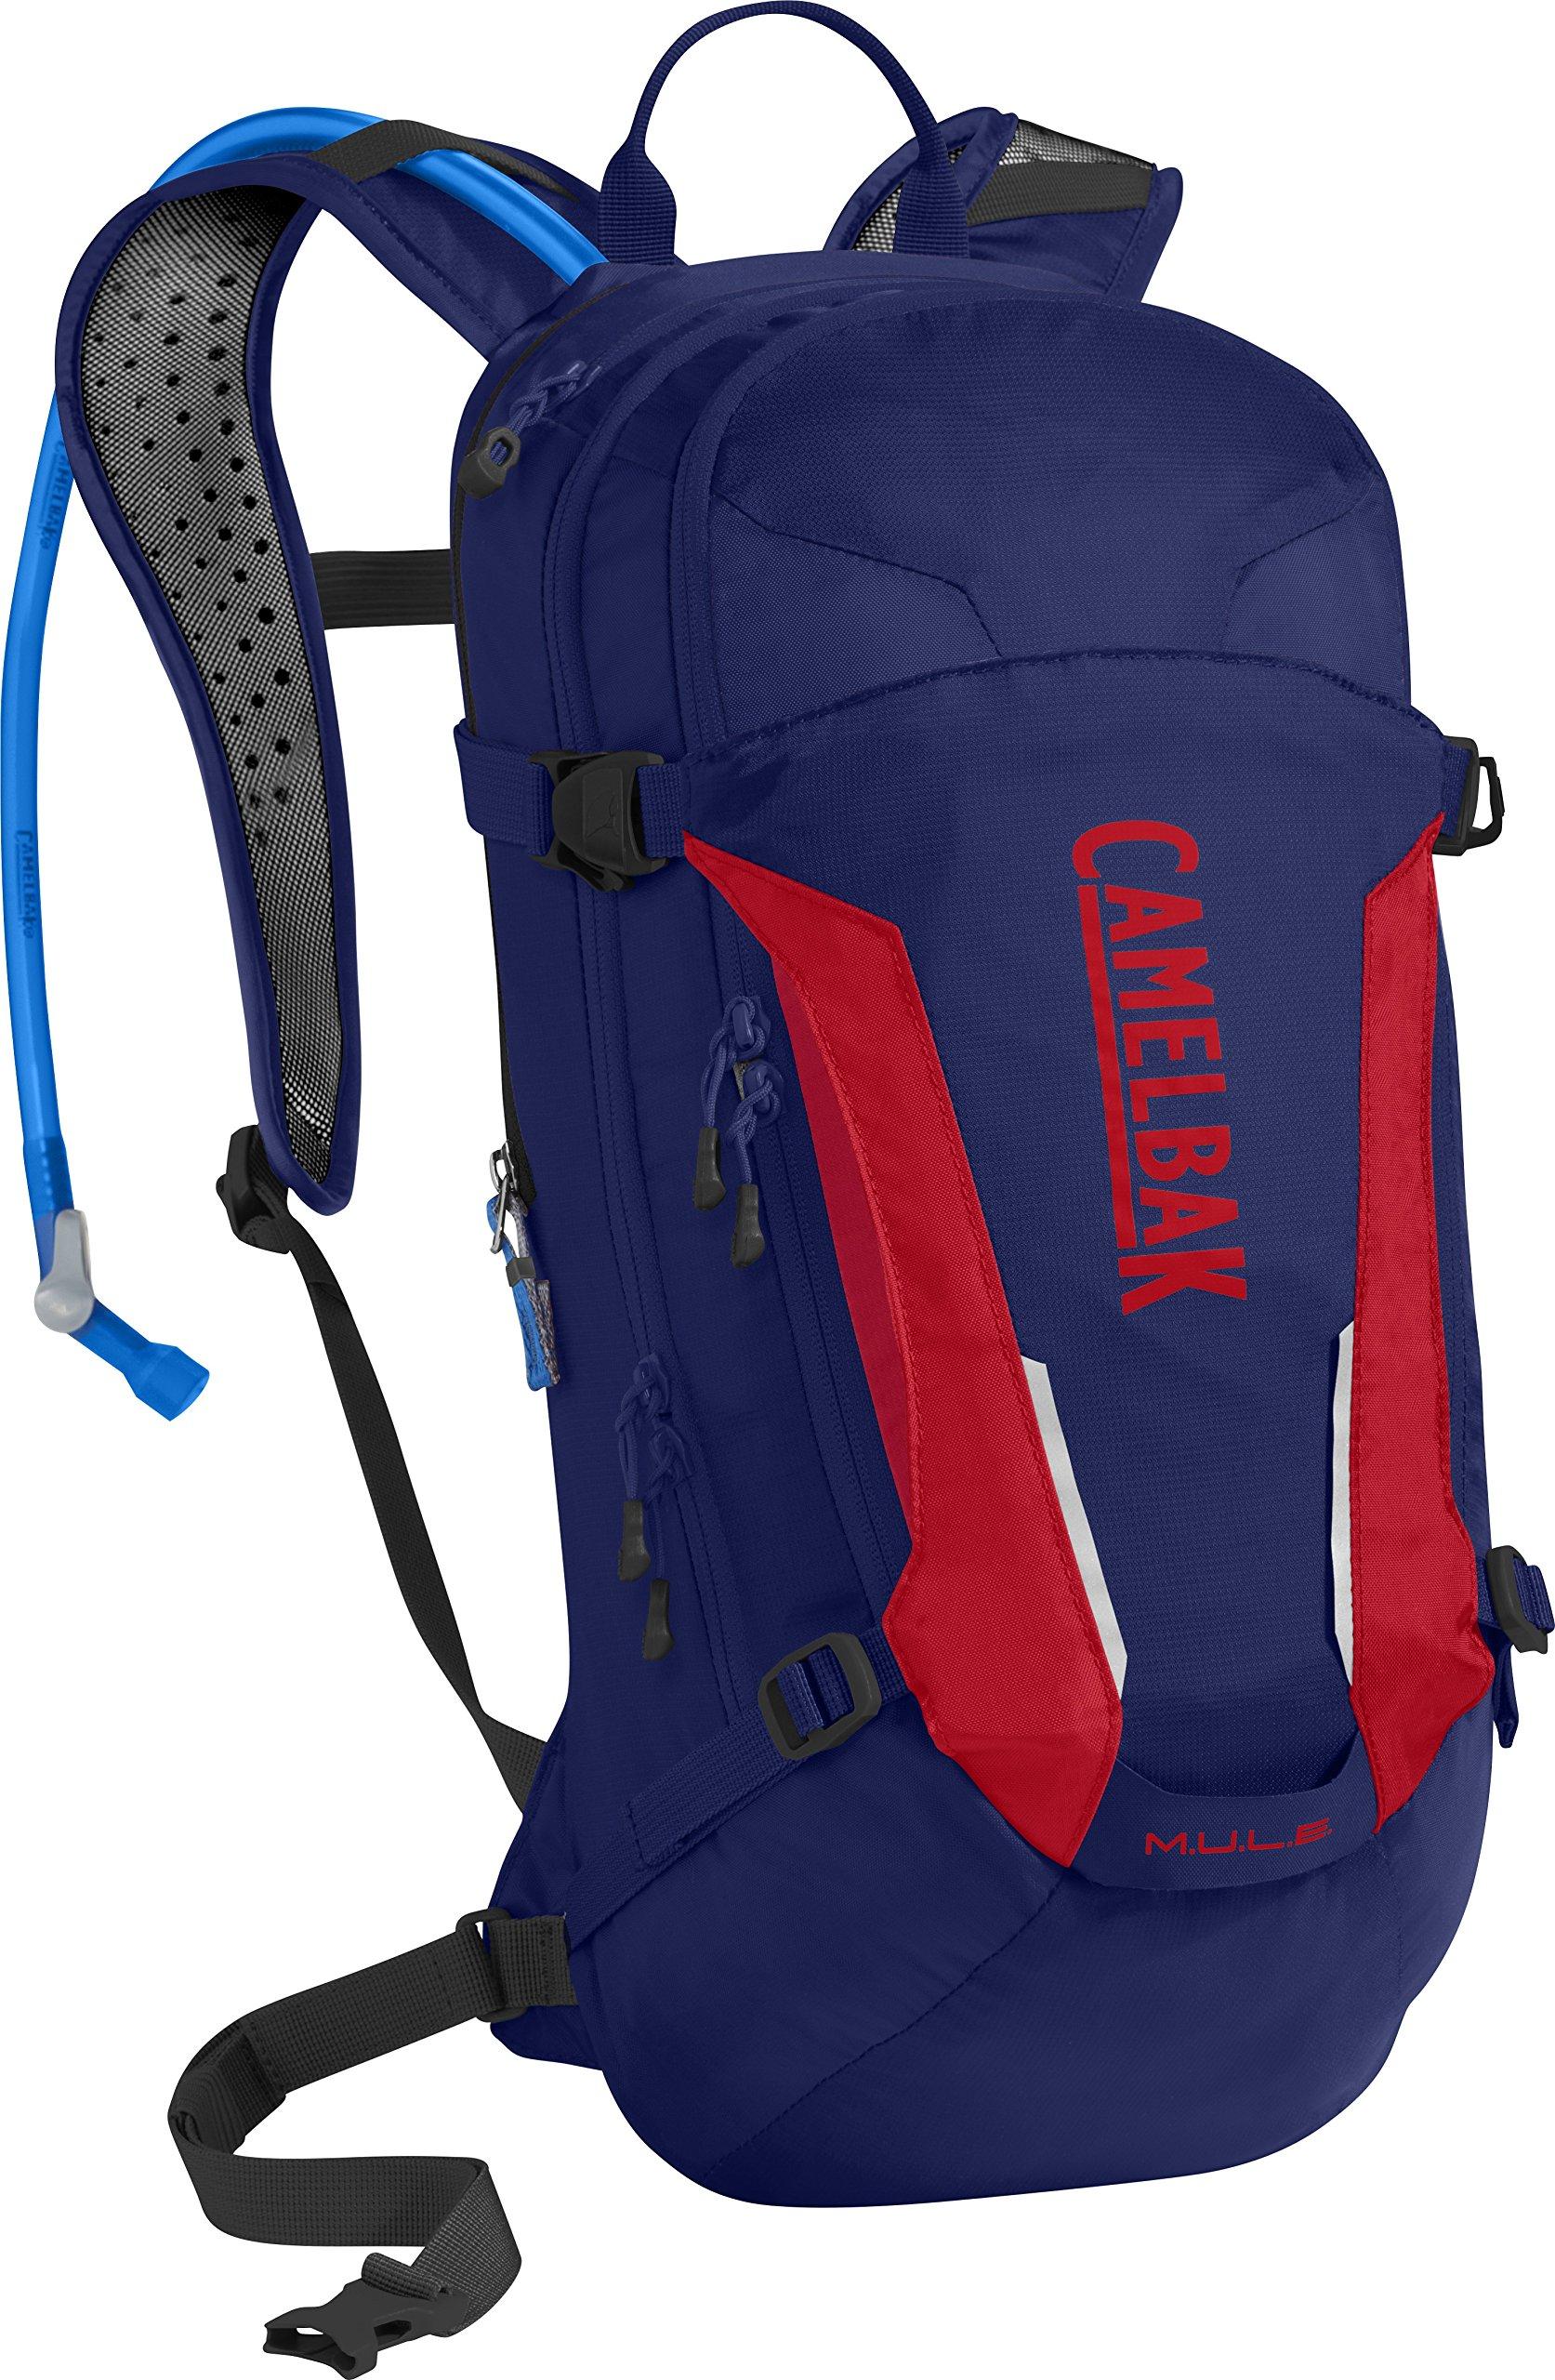 CamelBak M.U.L.E. 100 oz Hydration Pack, Pitch Blue/Racing Red